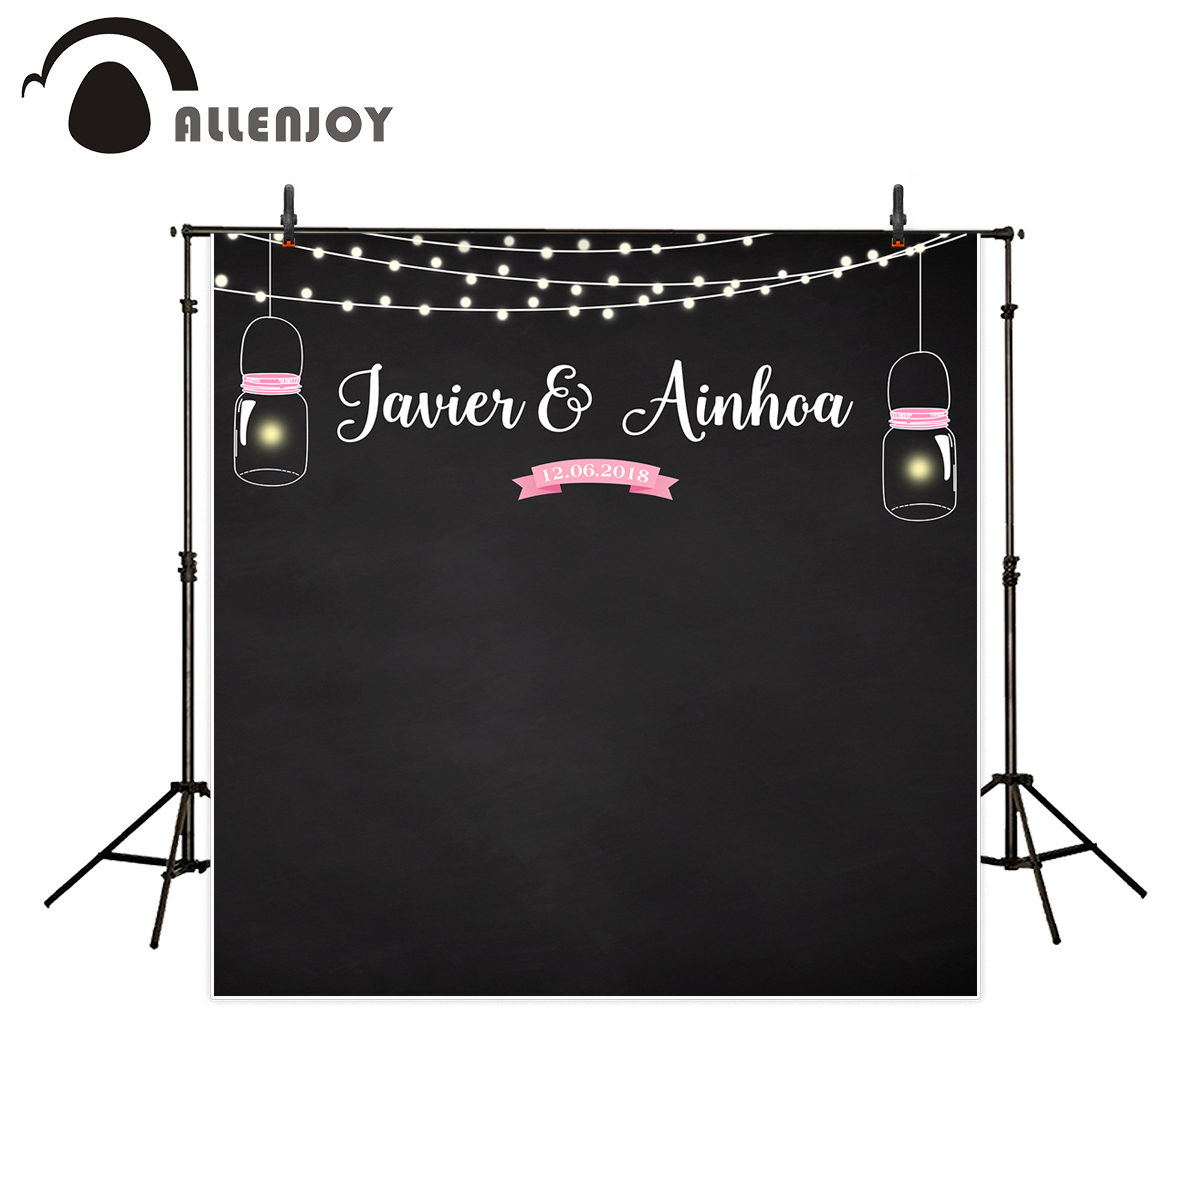 Allenjoy backgrounds for photography studio black shiny firefly pink Banner wedding customize backdrop photocall original design